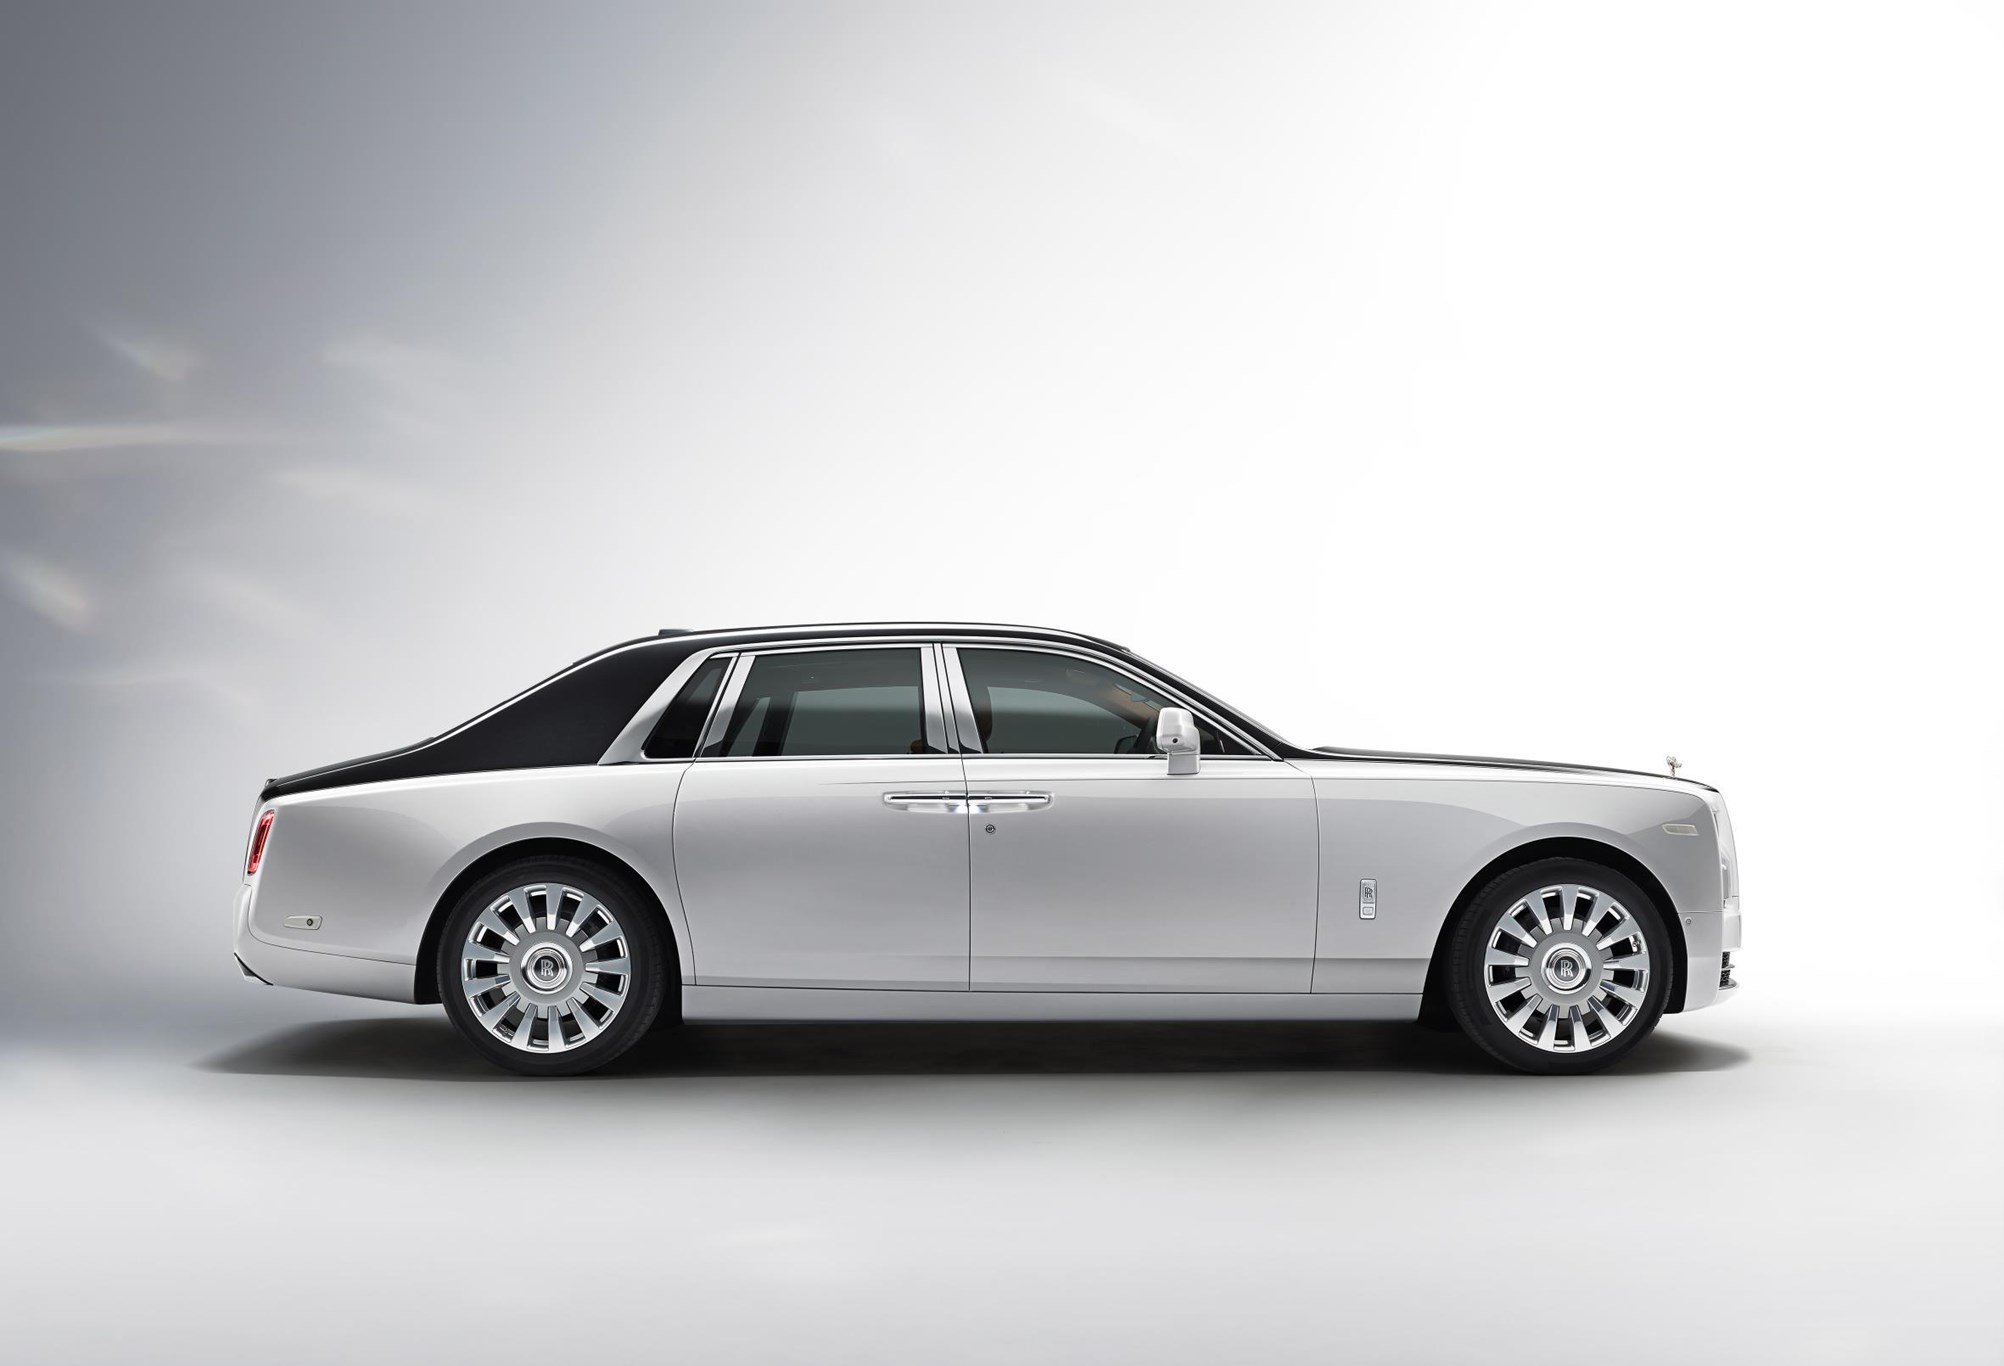 New 2018 Rolls Royce Phantom VIII